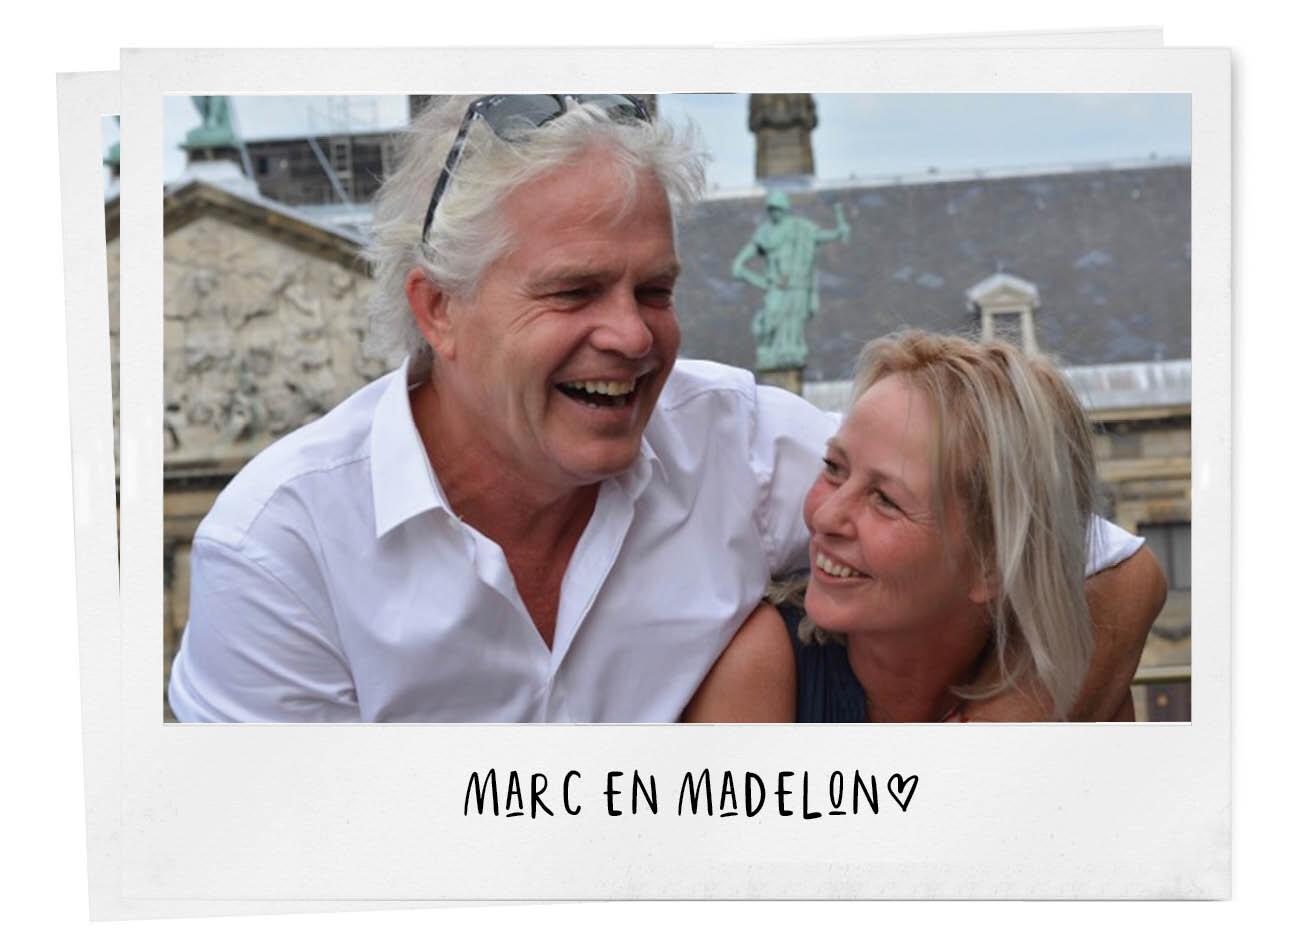 Marc en Madelon